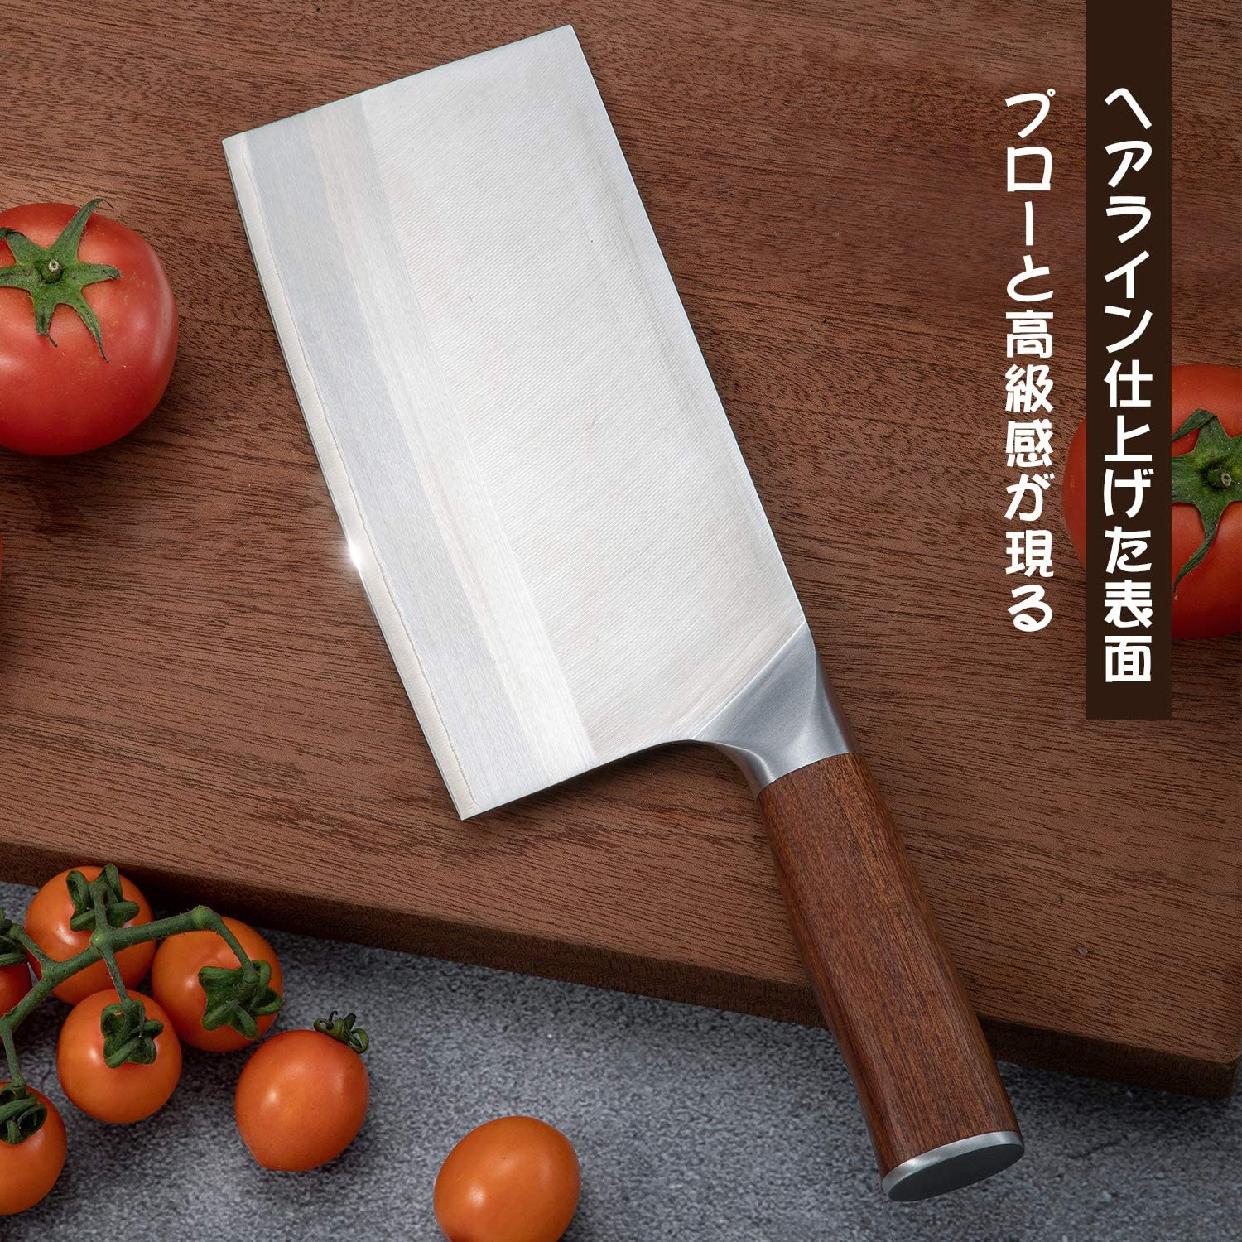 MUKAI(ムカイ) 中華包丁 29.5cmの商品画像4